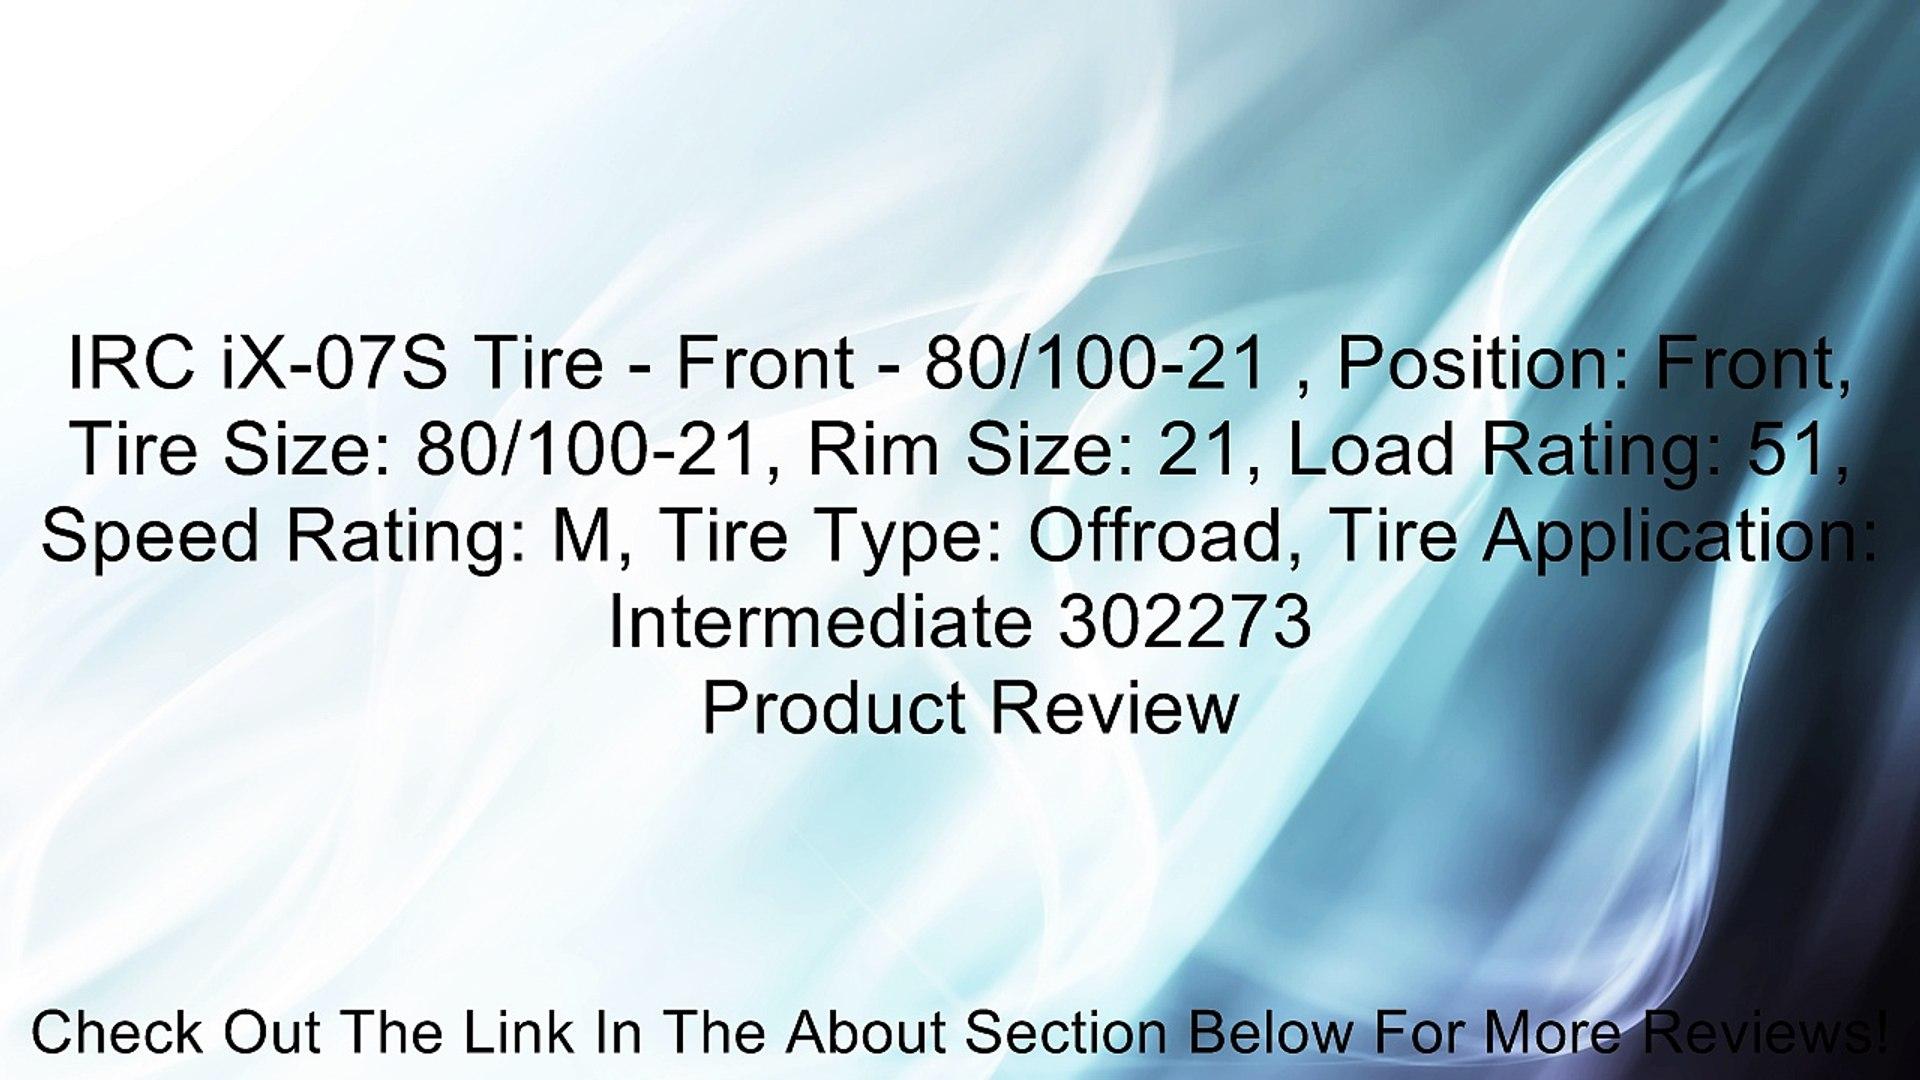 IRC iX-07S Tire - Front - 80/100-21 , Position: Front, Tire Size: 80/100-21, Rim Size: 21, Load Rati